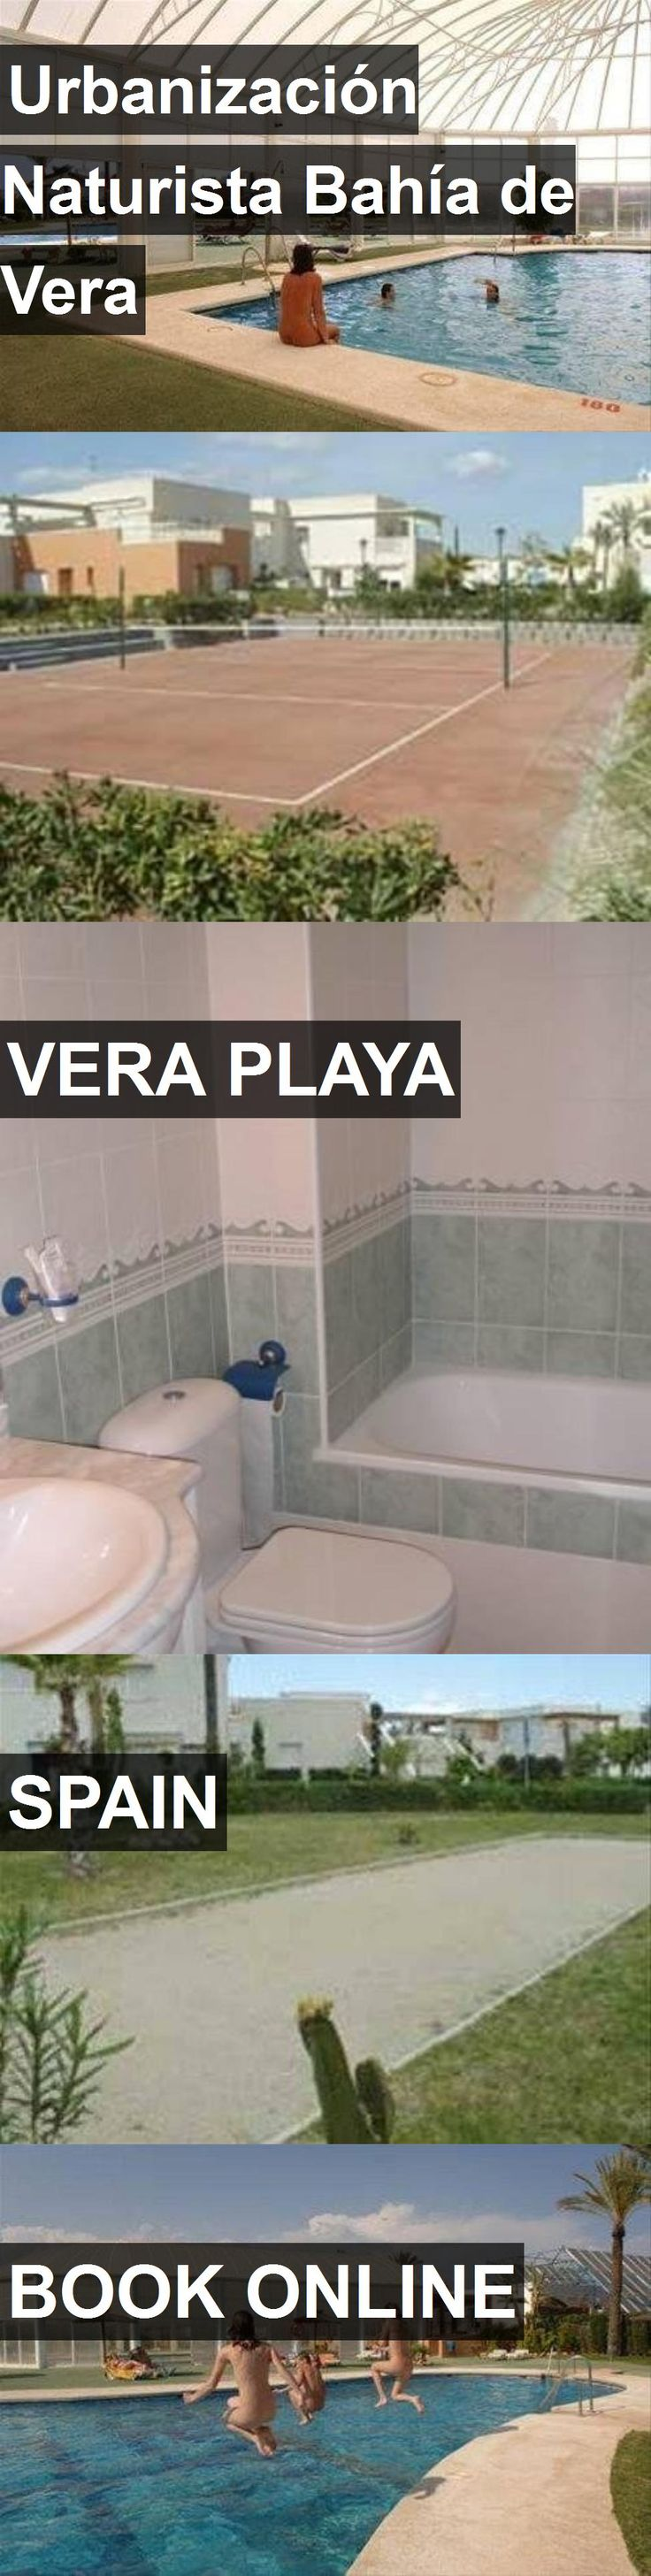 Hotel Urbanización Naturista Bahía de Vera in Vera Playa, Spain. For more information, photos, reviews and best prices please follow the link. #Spain #VeraPlaya #UrbanizaciónNaturistaBahíadeVera #hotel #travel #vacation